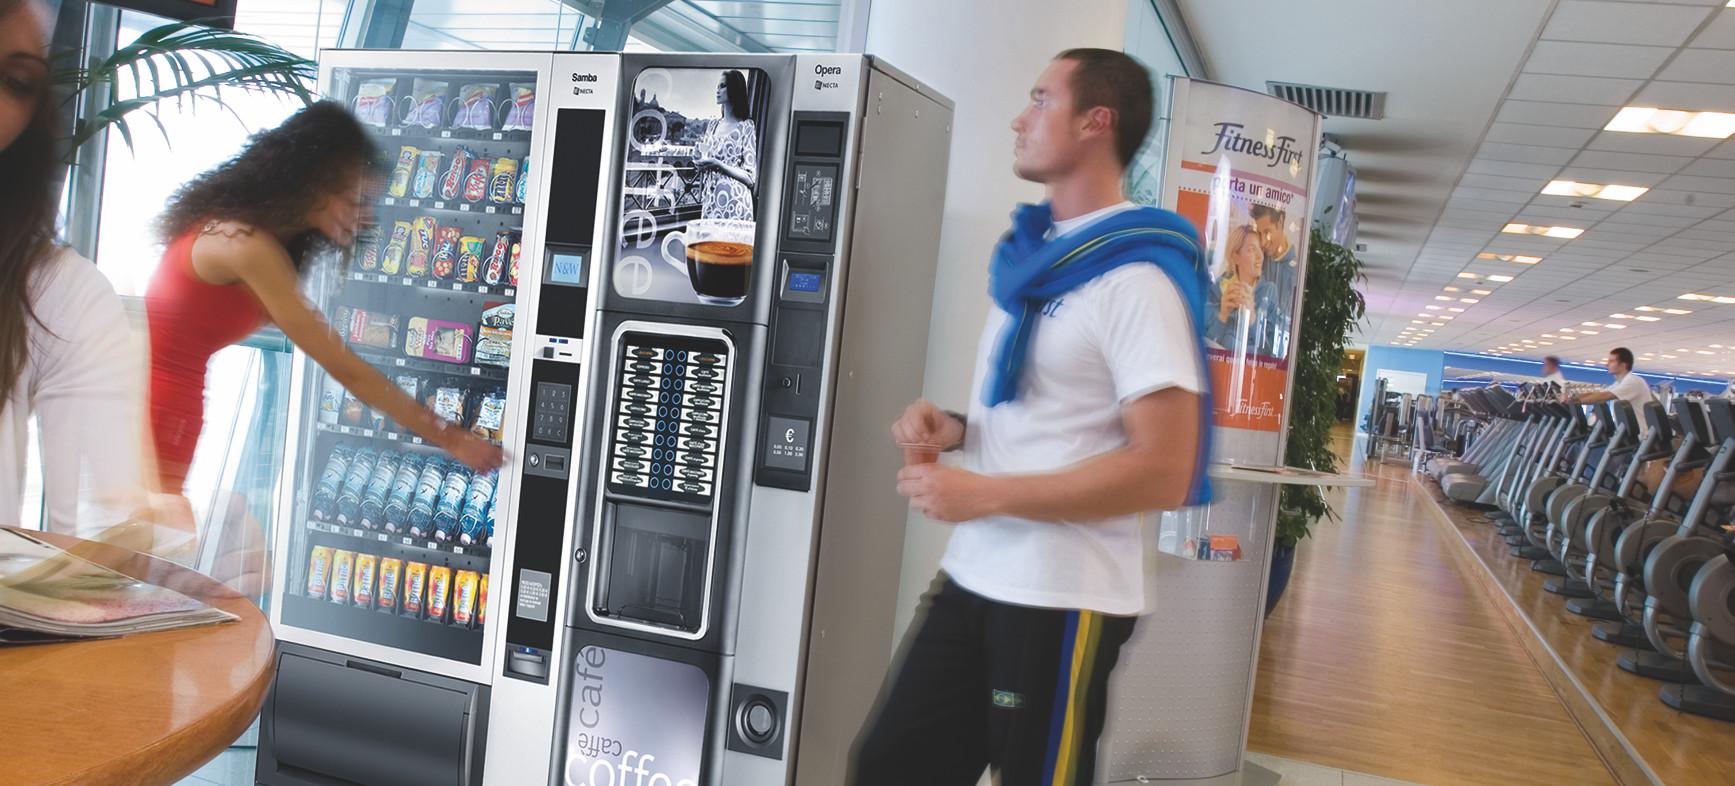 Gym and Leisure Centre Vending Solutions | Vendtrade